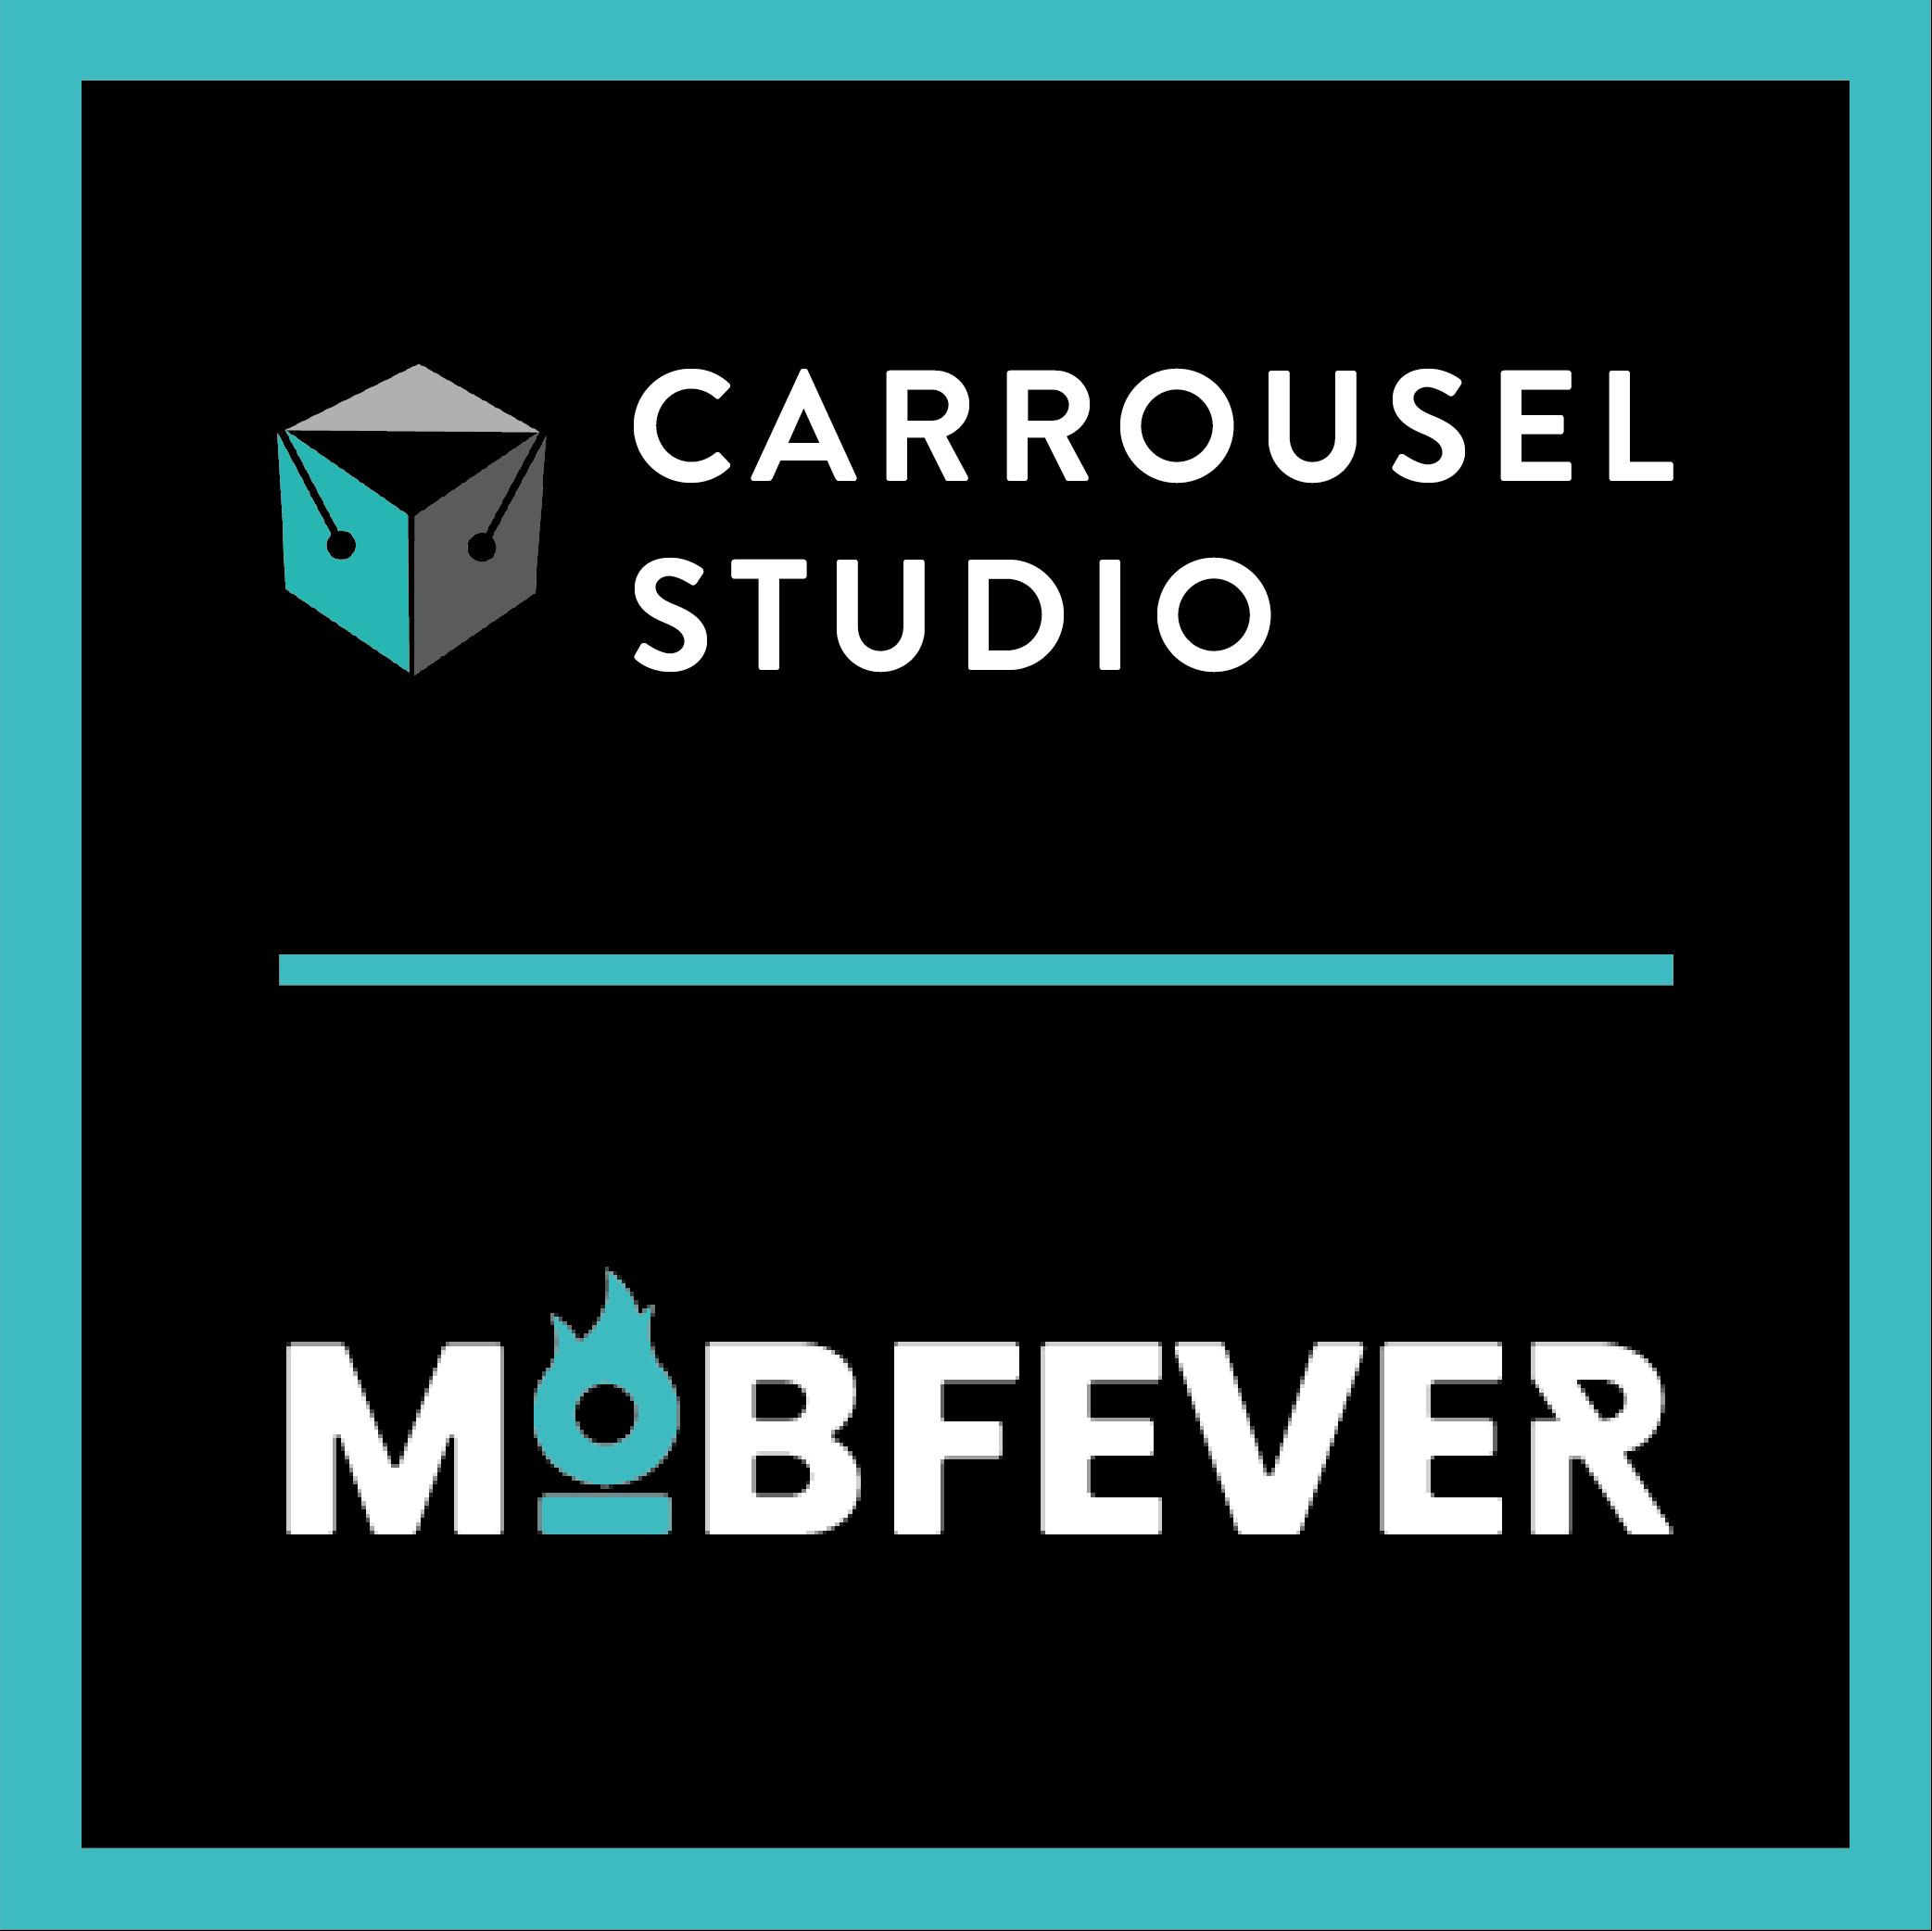 Carrousel Studio Ltd